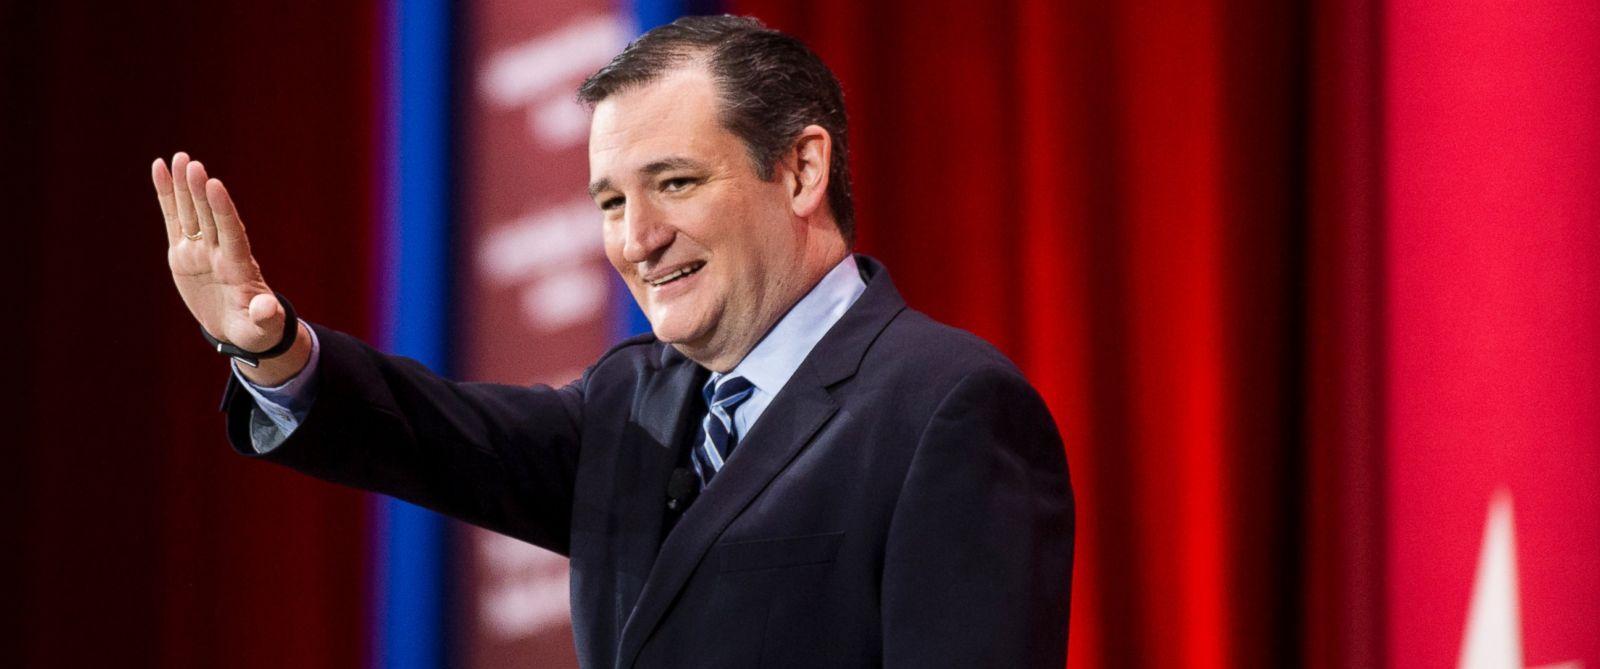 PHOTO: Senator Ted Cruz speaks at CPAC in National Harbor, Md., on Feb. 26, 2015.